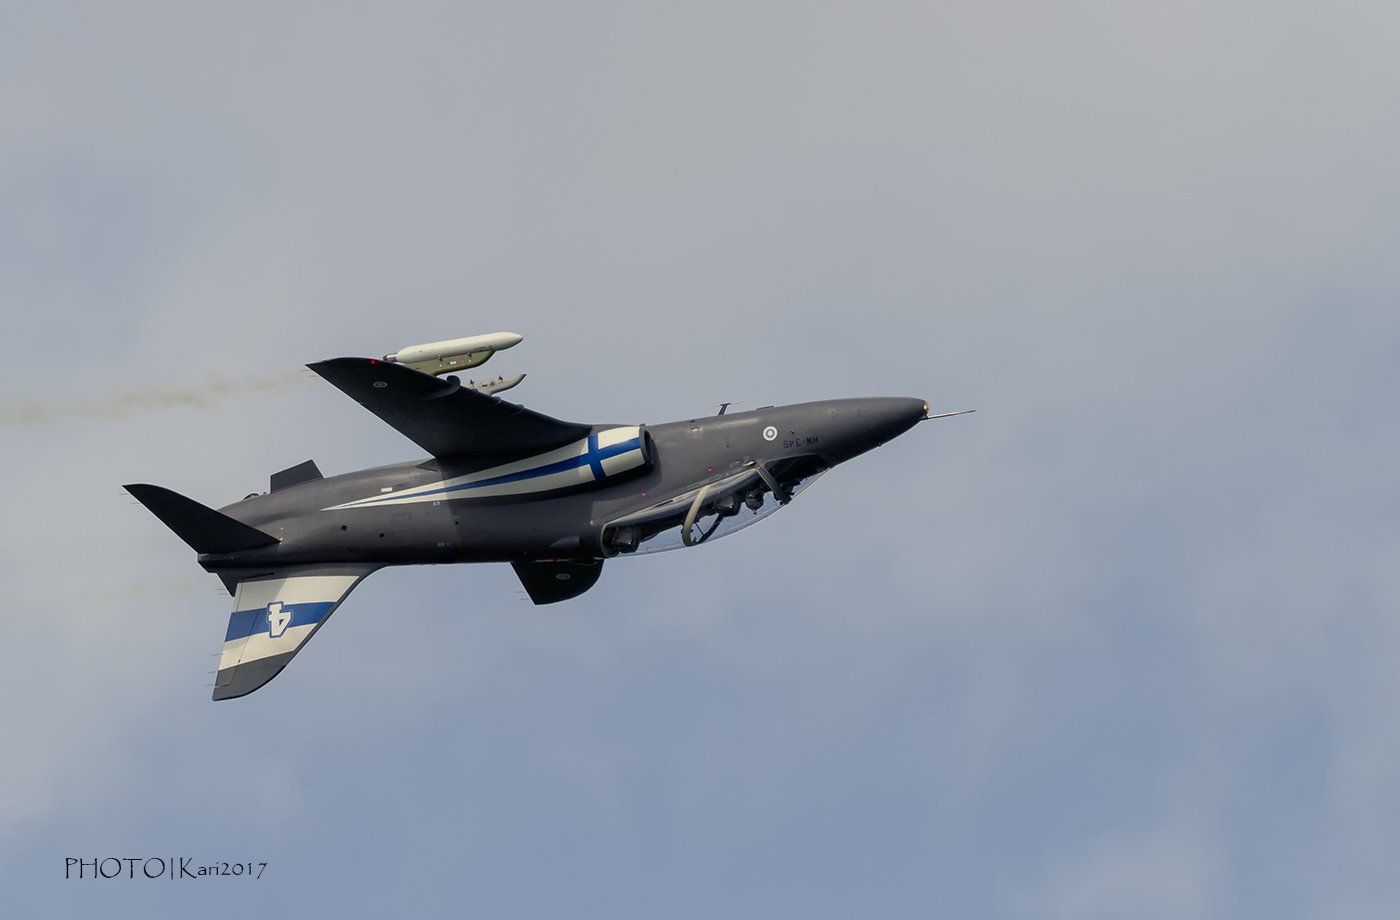 Hawk Mk51